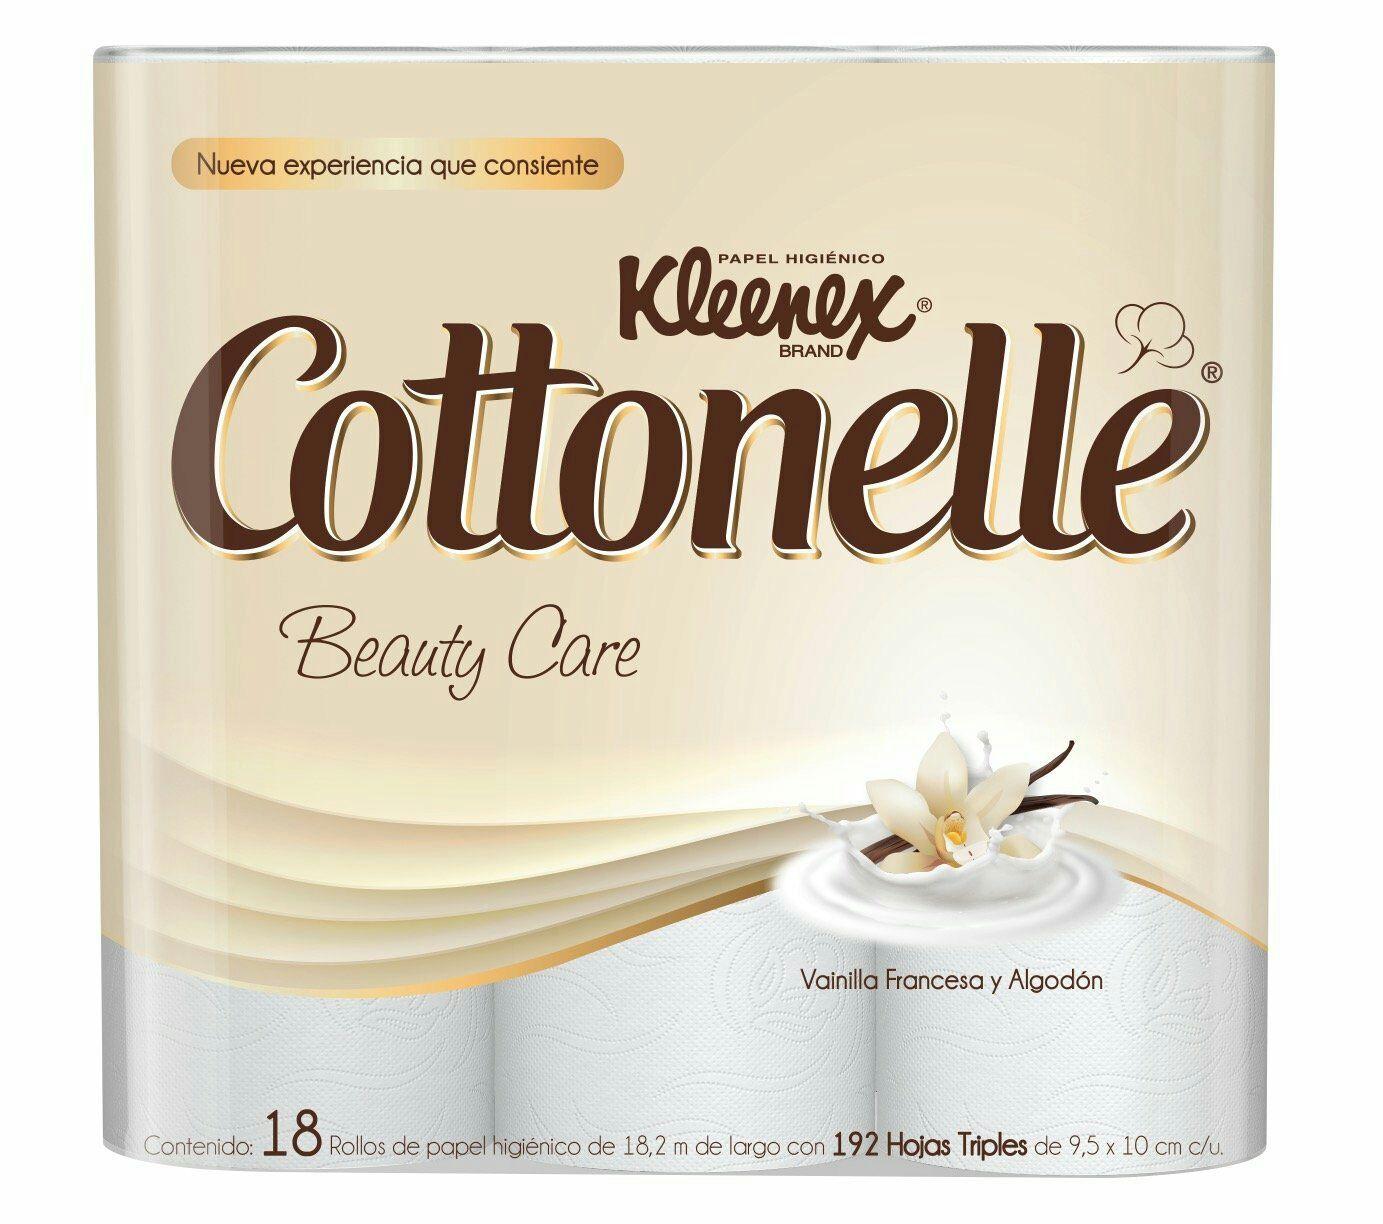 Superama Parques Polanco cdmx: Kleenex Cottonelle de 18 rollos a 2x80